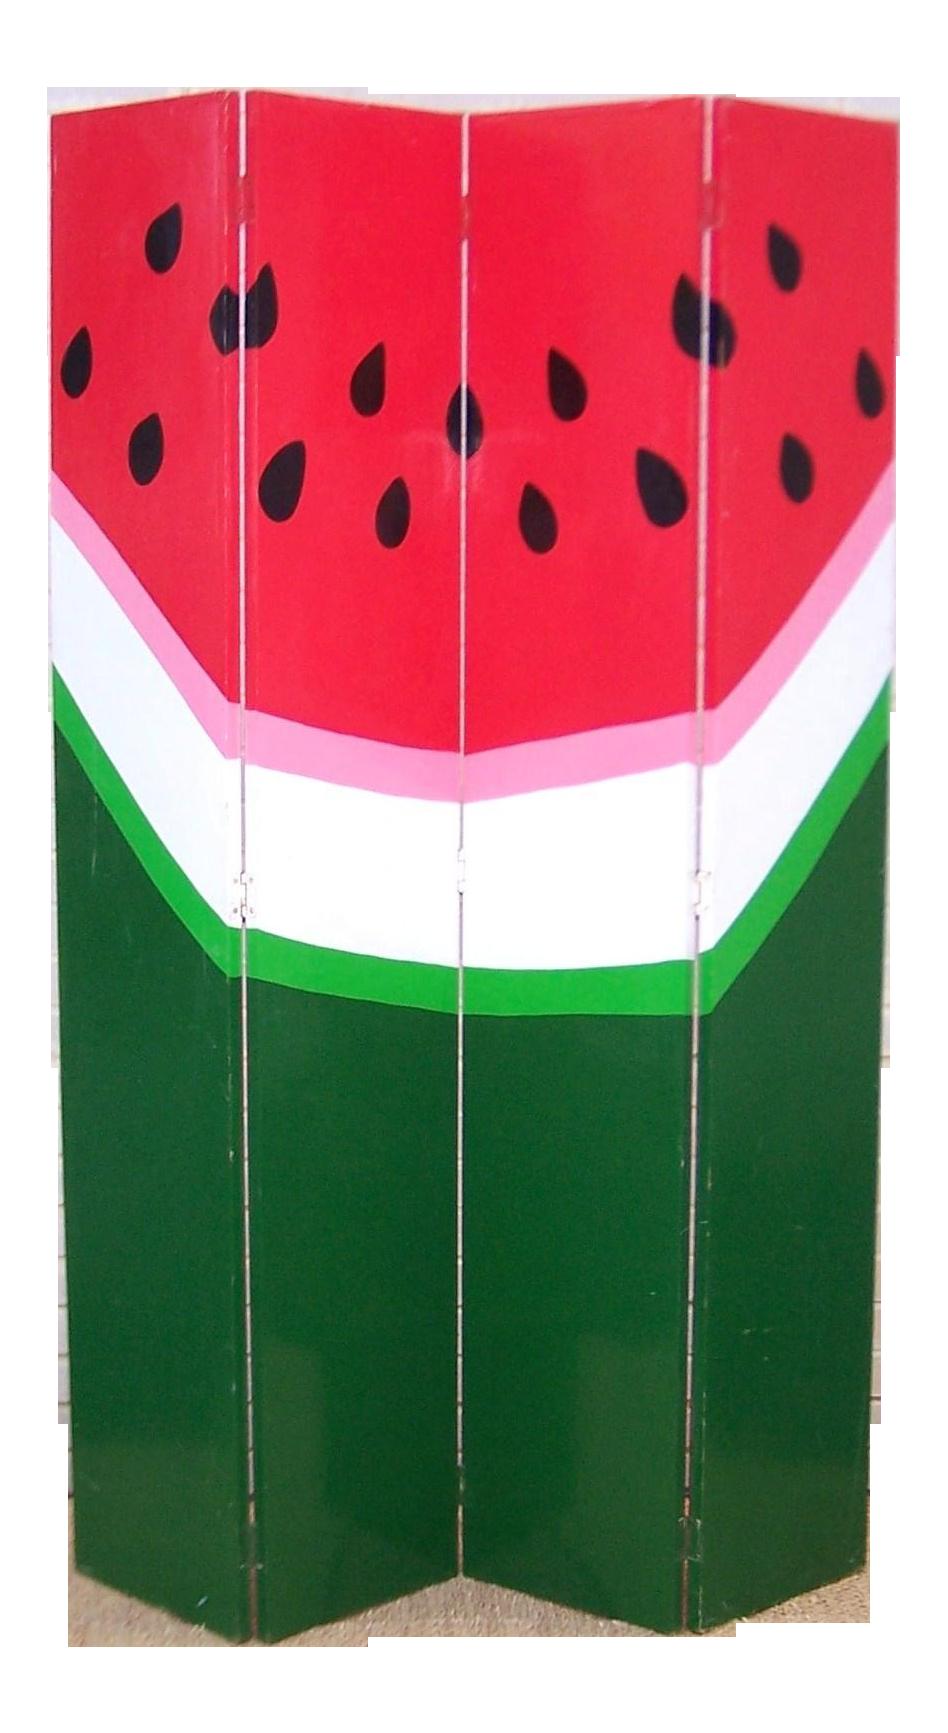 Hand painted screen chairish. Watermelon clipart pop art